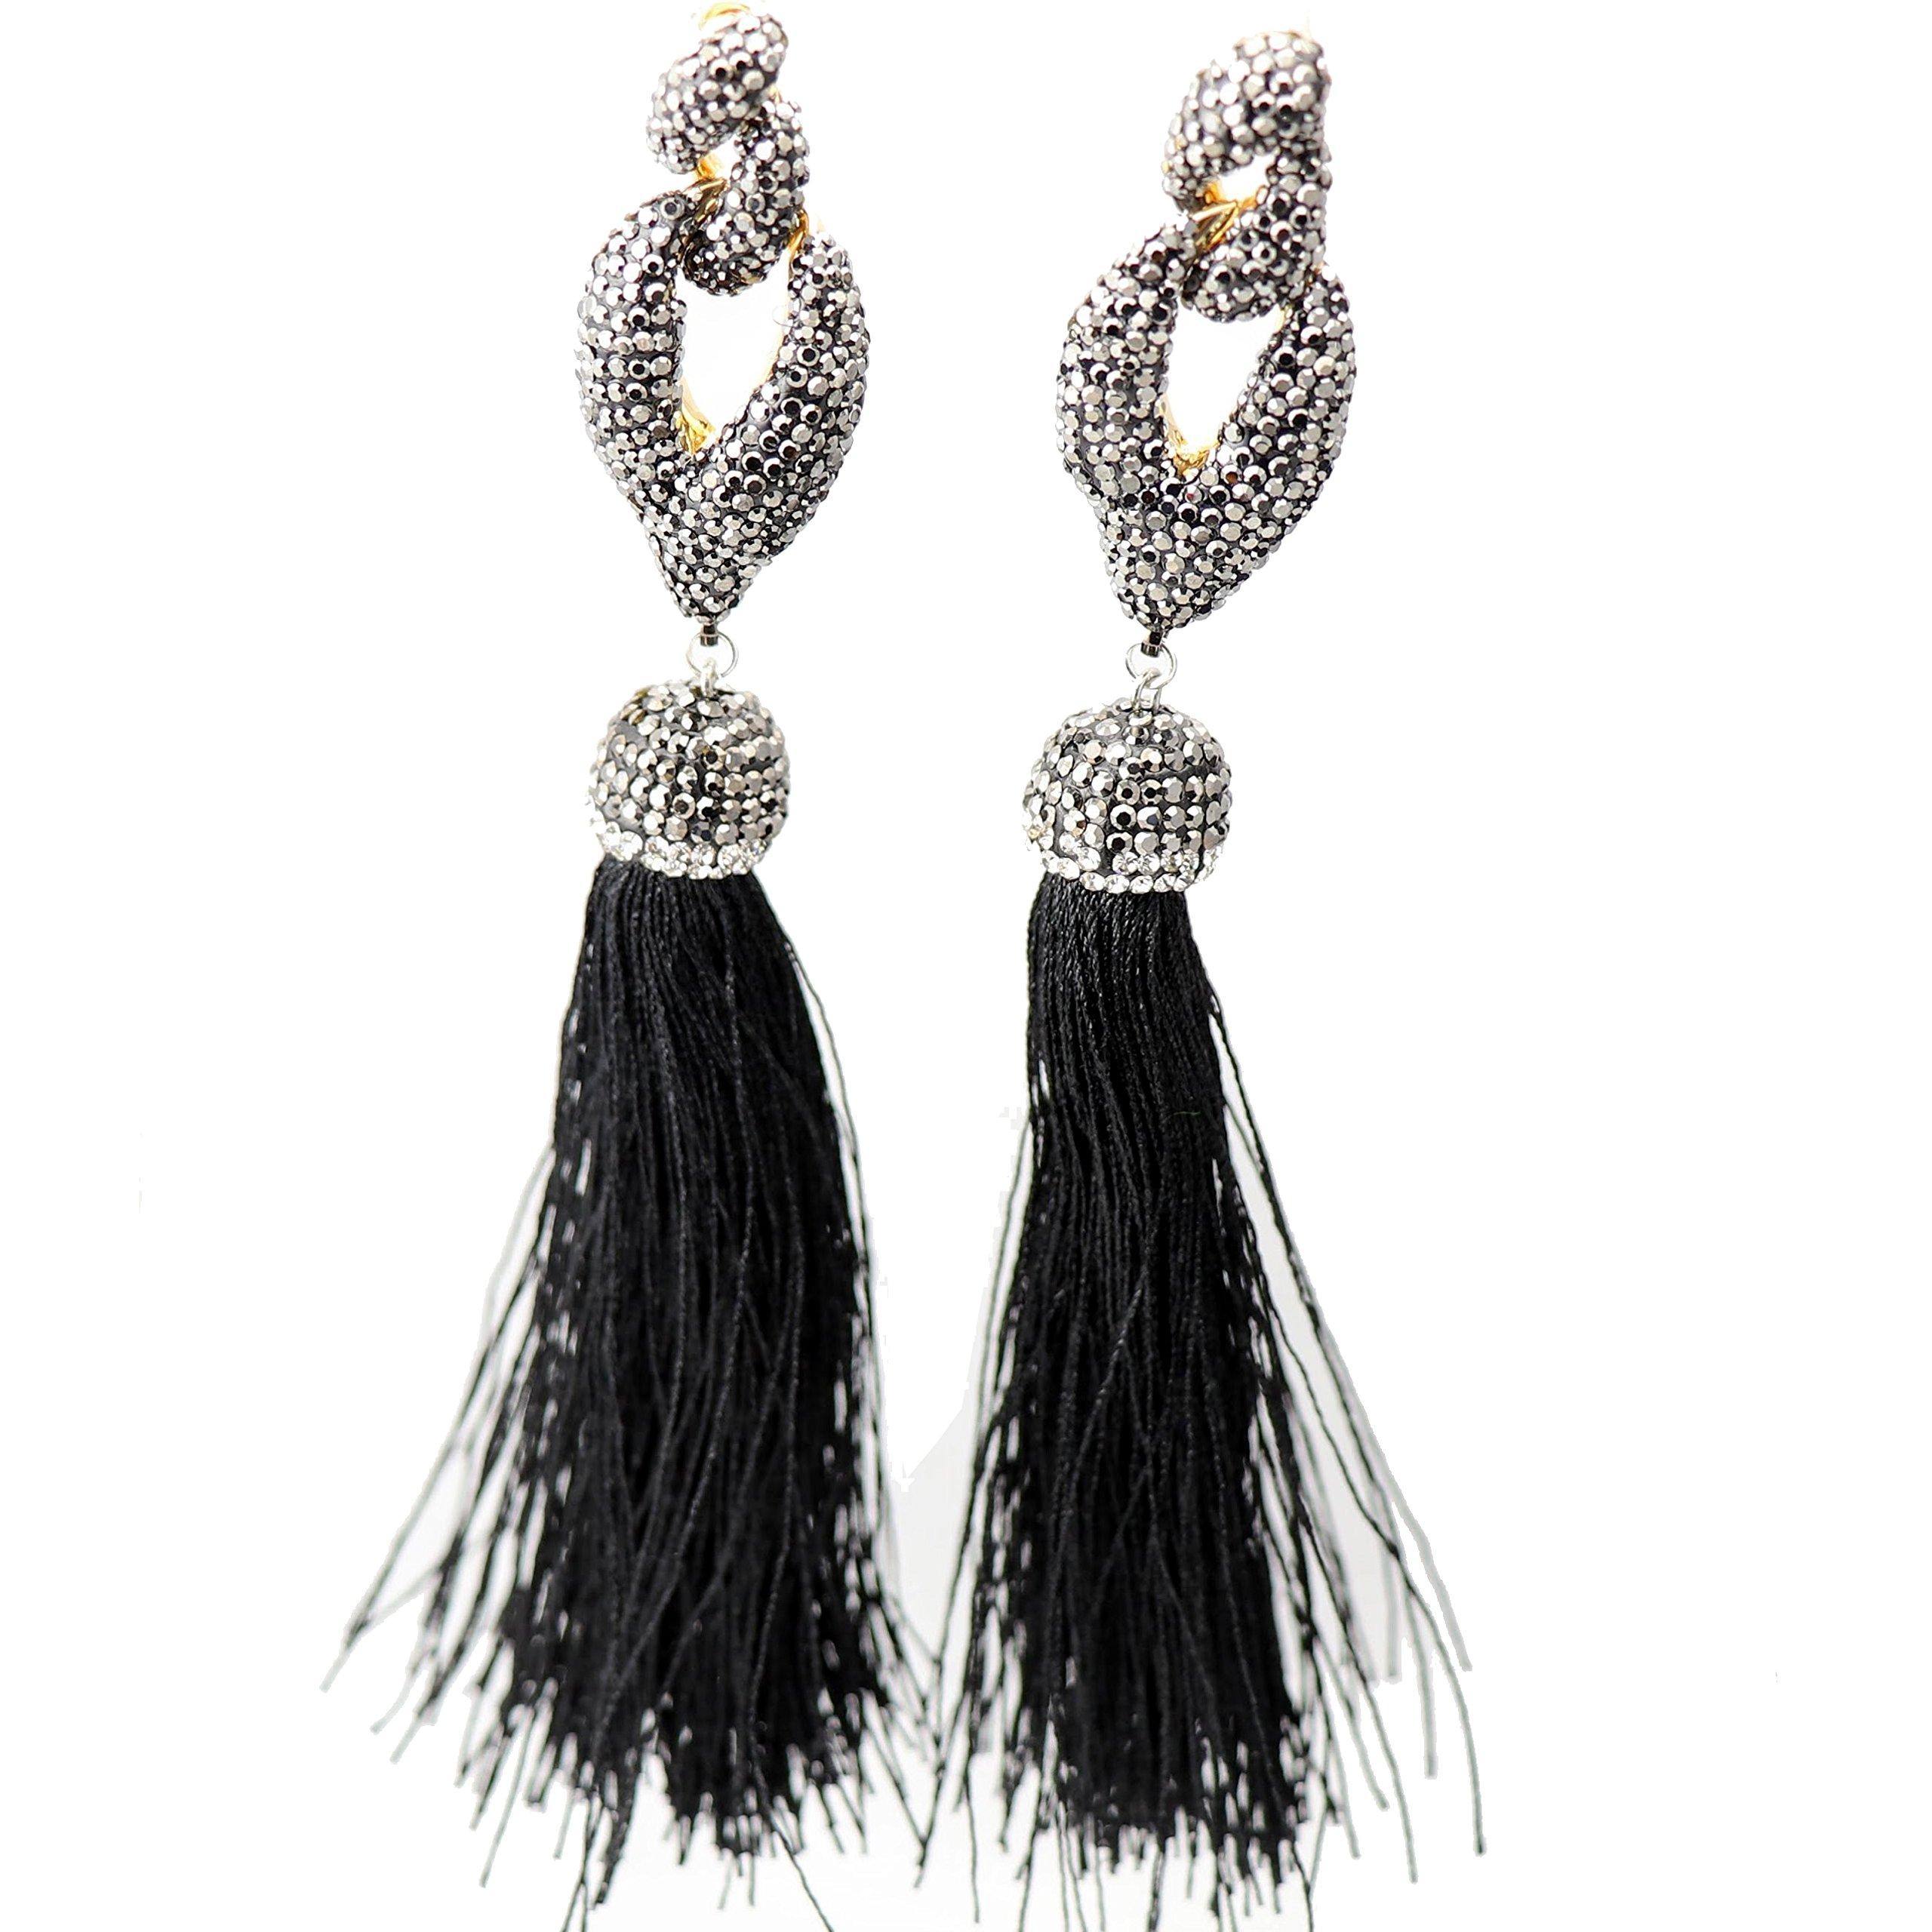 NEW Big Bold Beautiful High End Fashion Tassel Rhinestone Drop Dangle Druzy CZ Stud Earrings   28 Designs (Dancing Black) by Trend Builder Inc (Image #1)